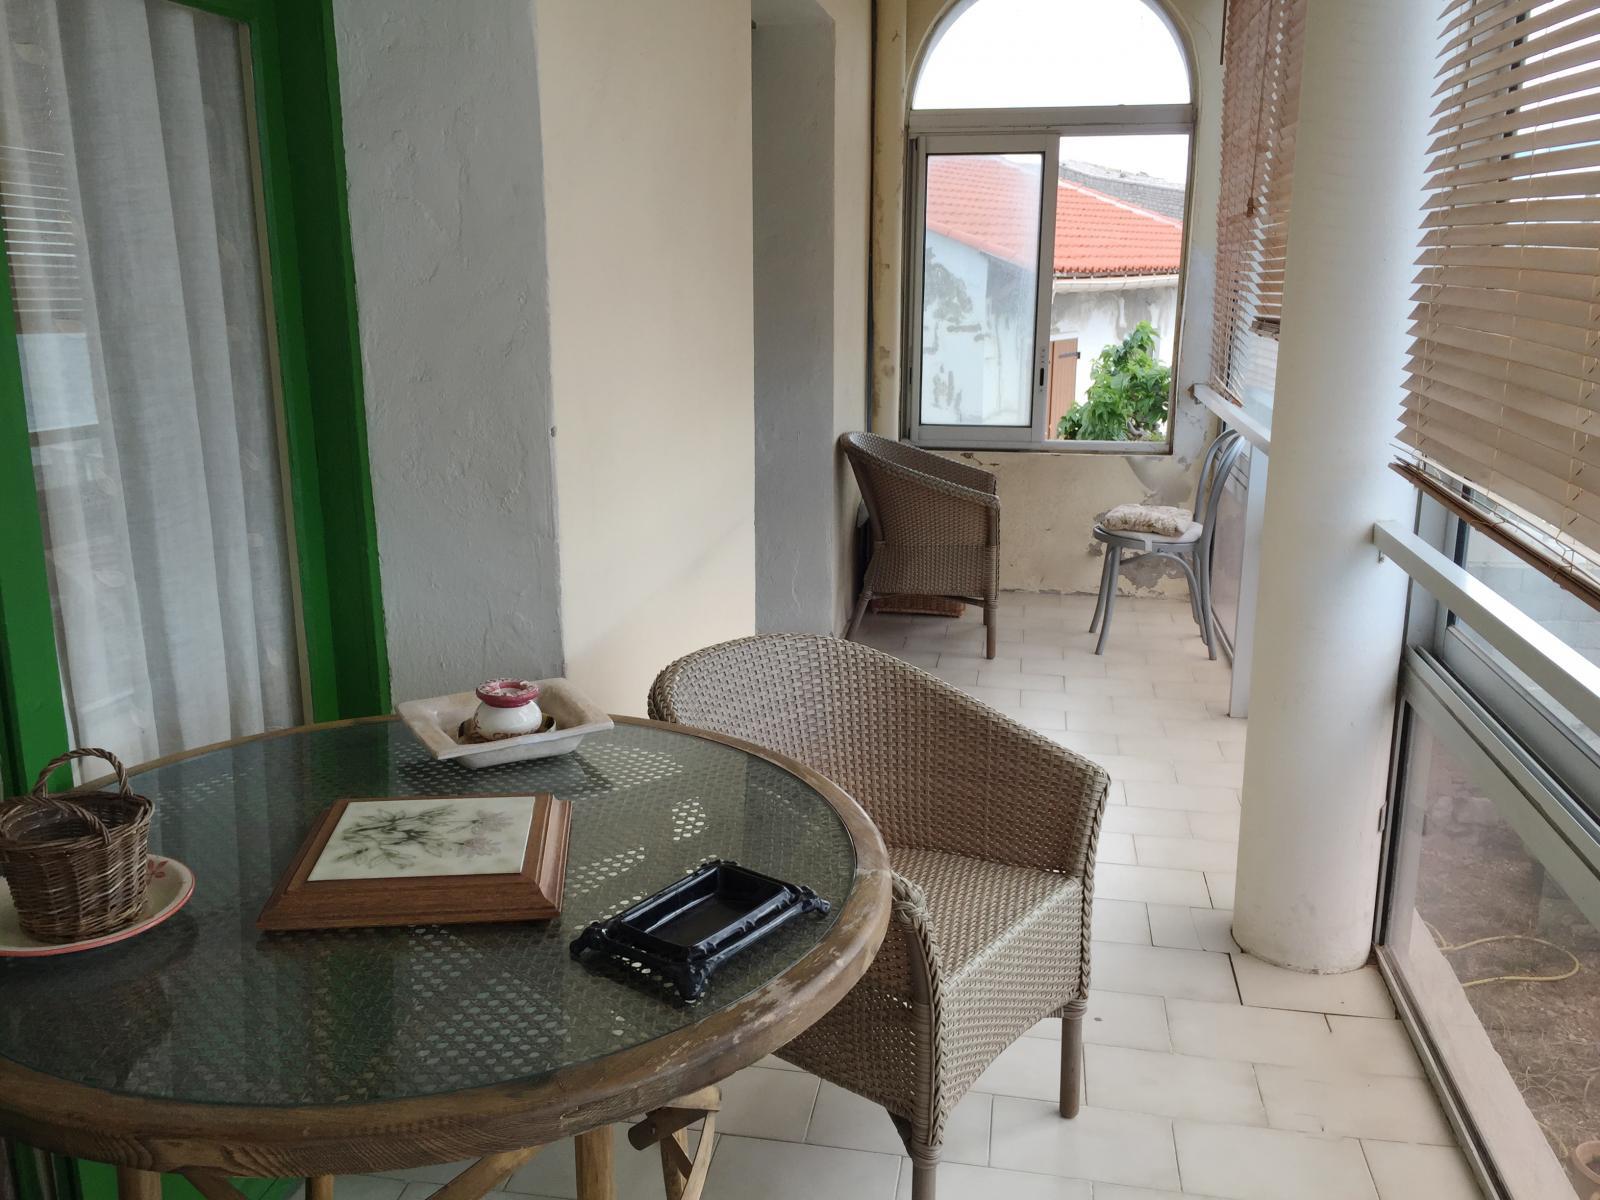 annonce vente appartement s te 34200 90 m 345 000 992734364663. Black Bedroom Furniture Sets. Home Design Ideas